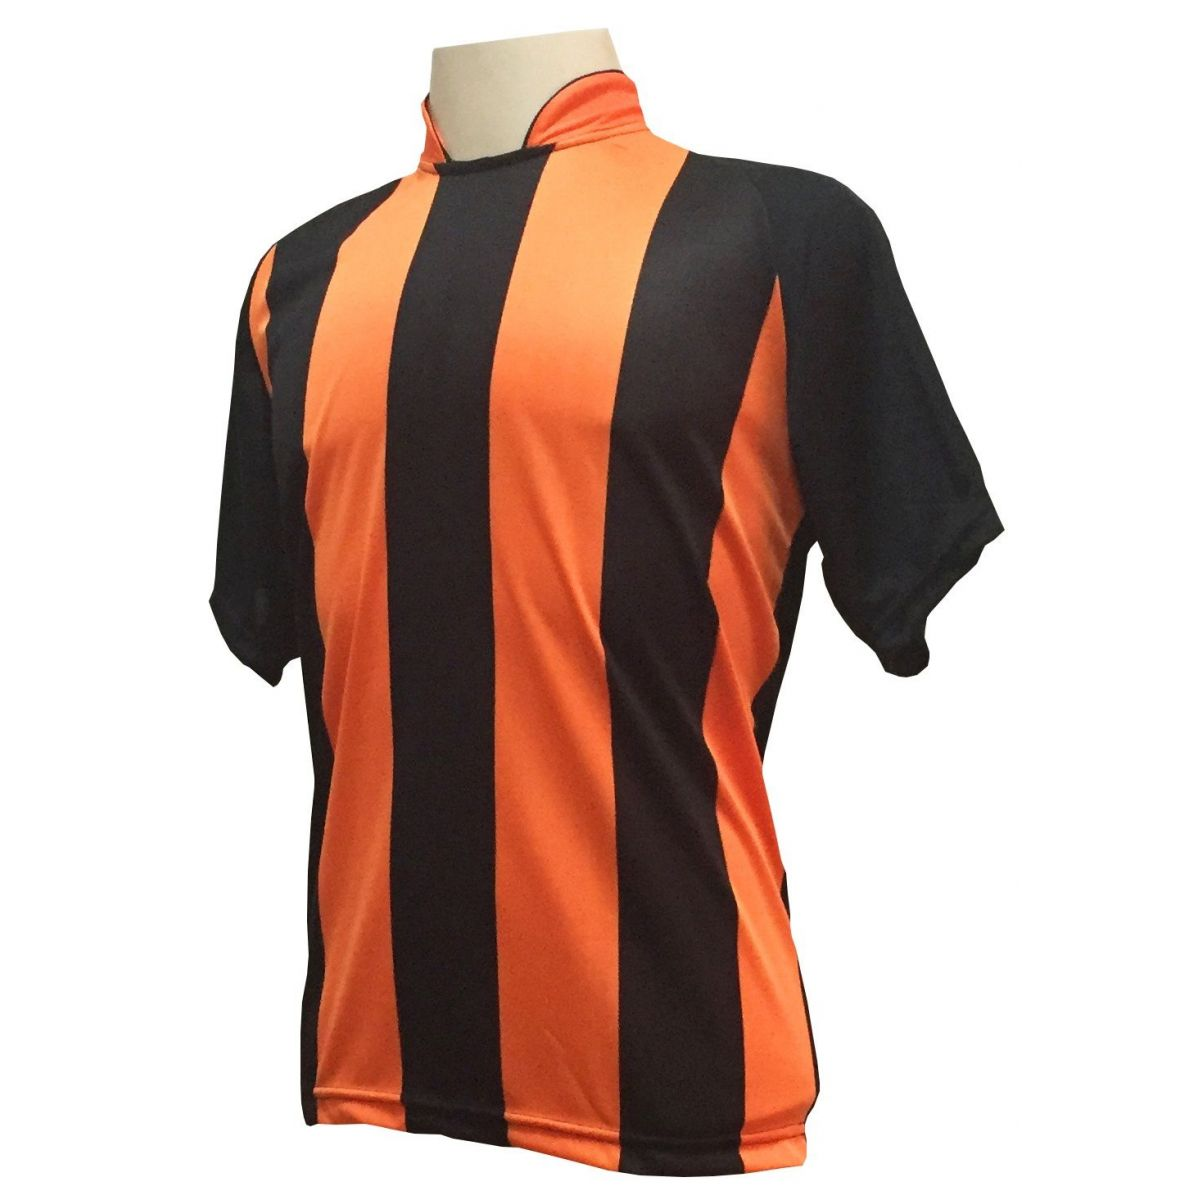 Jogo de Camisa com 20 unidades modelo Milan Preto/Laranja + Brindes